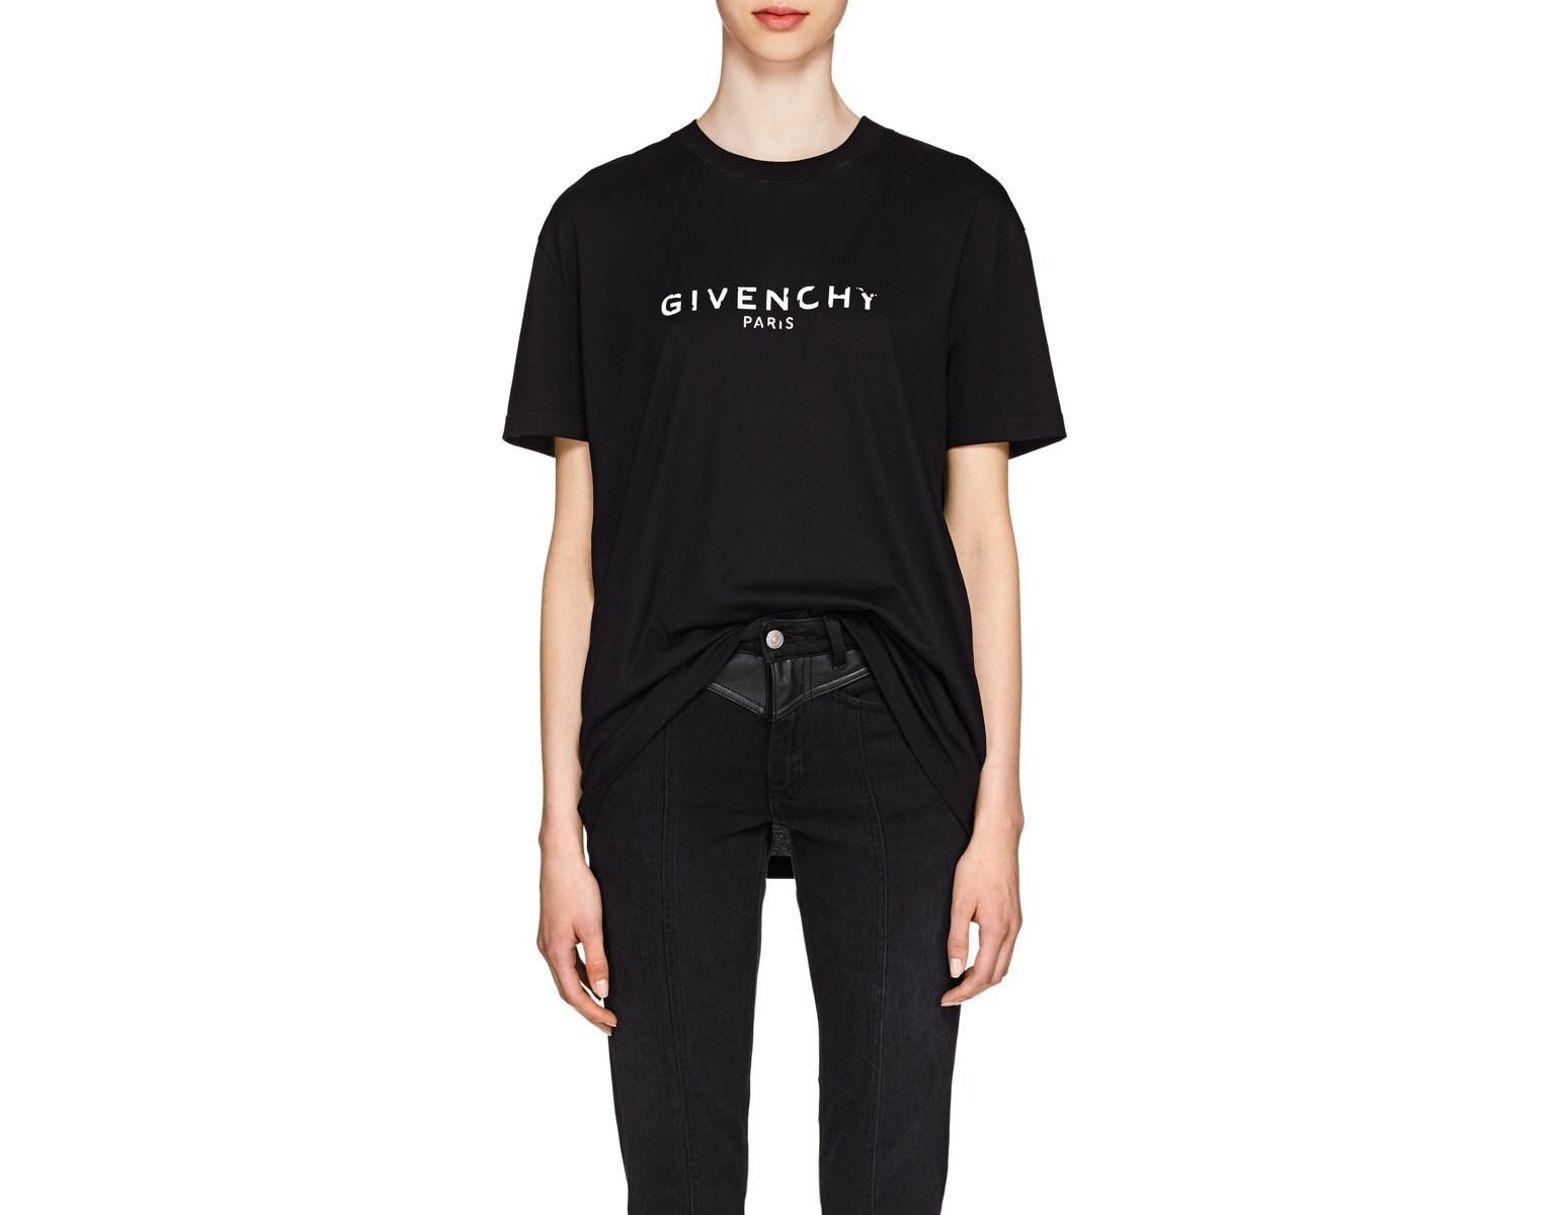 af62f7c2 Givenchy Shortsleeve T-shirt in Black - Save 55% - Lyst